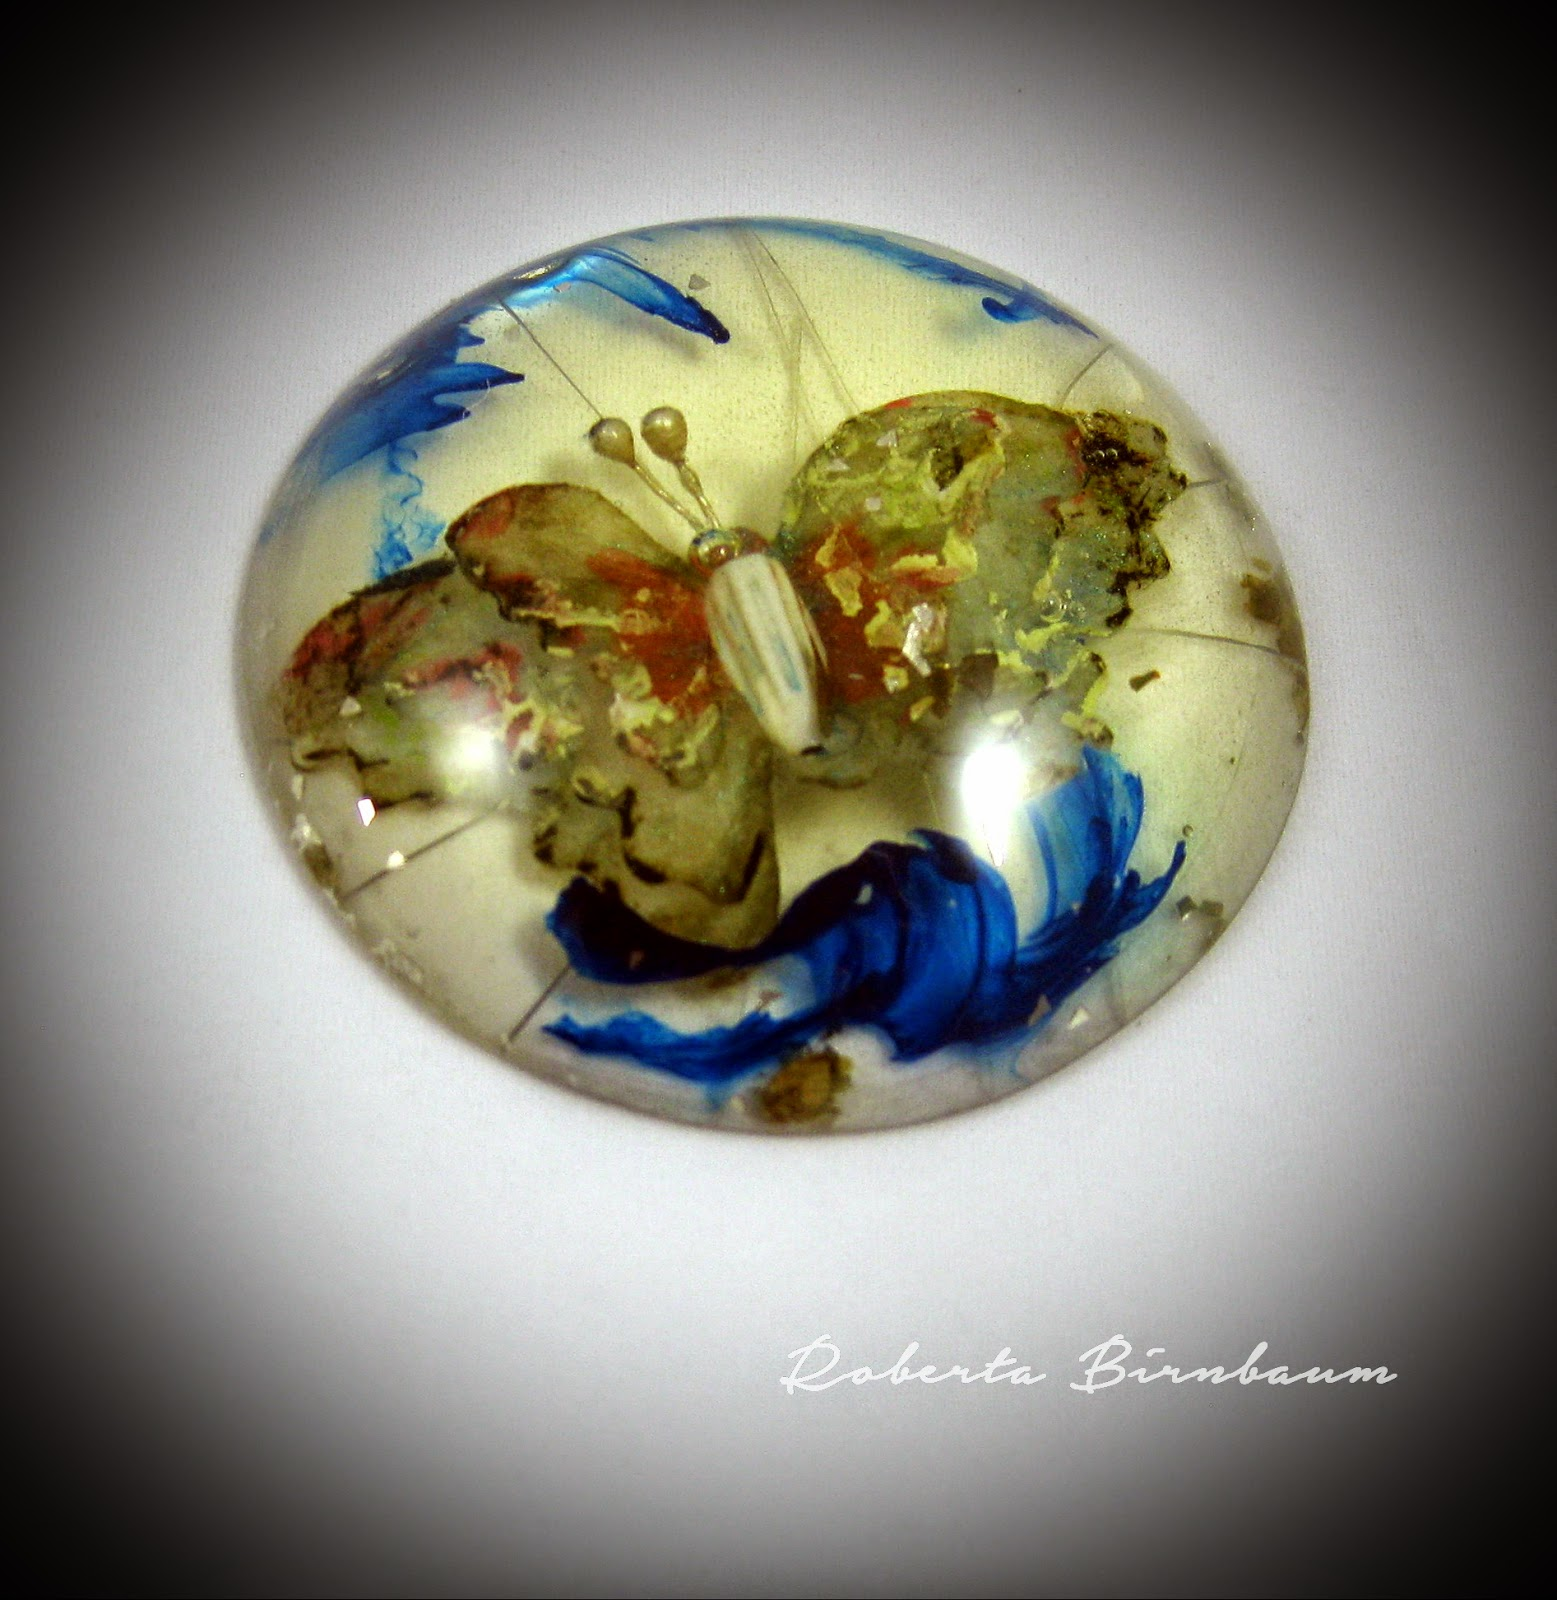 Roberta Birnbaum ETI resin butterfly paperweight